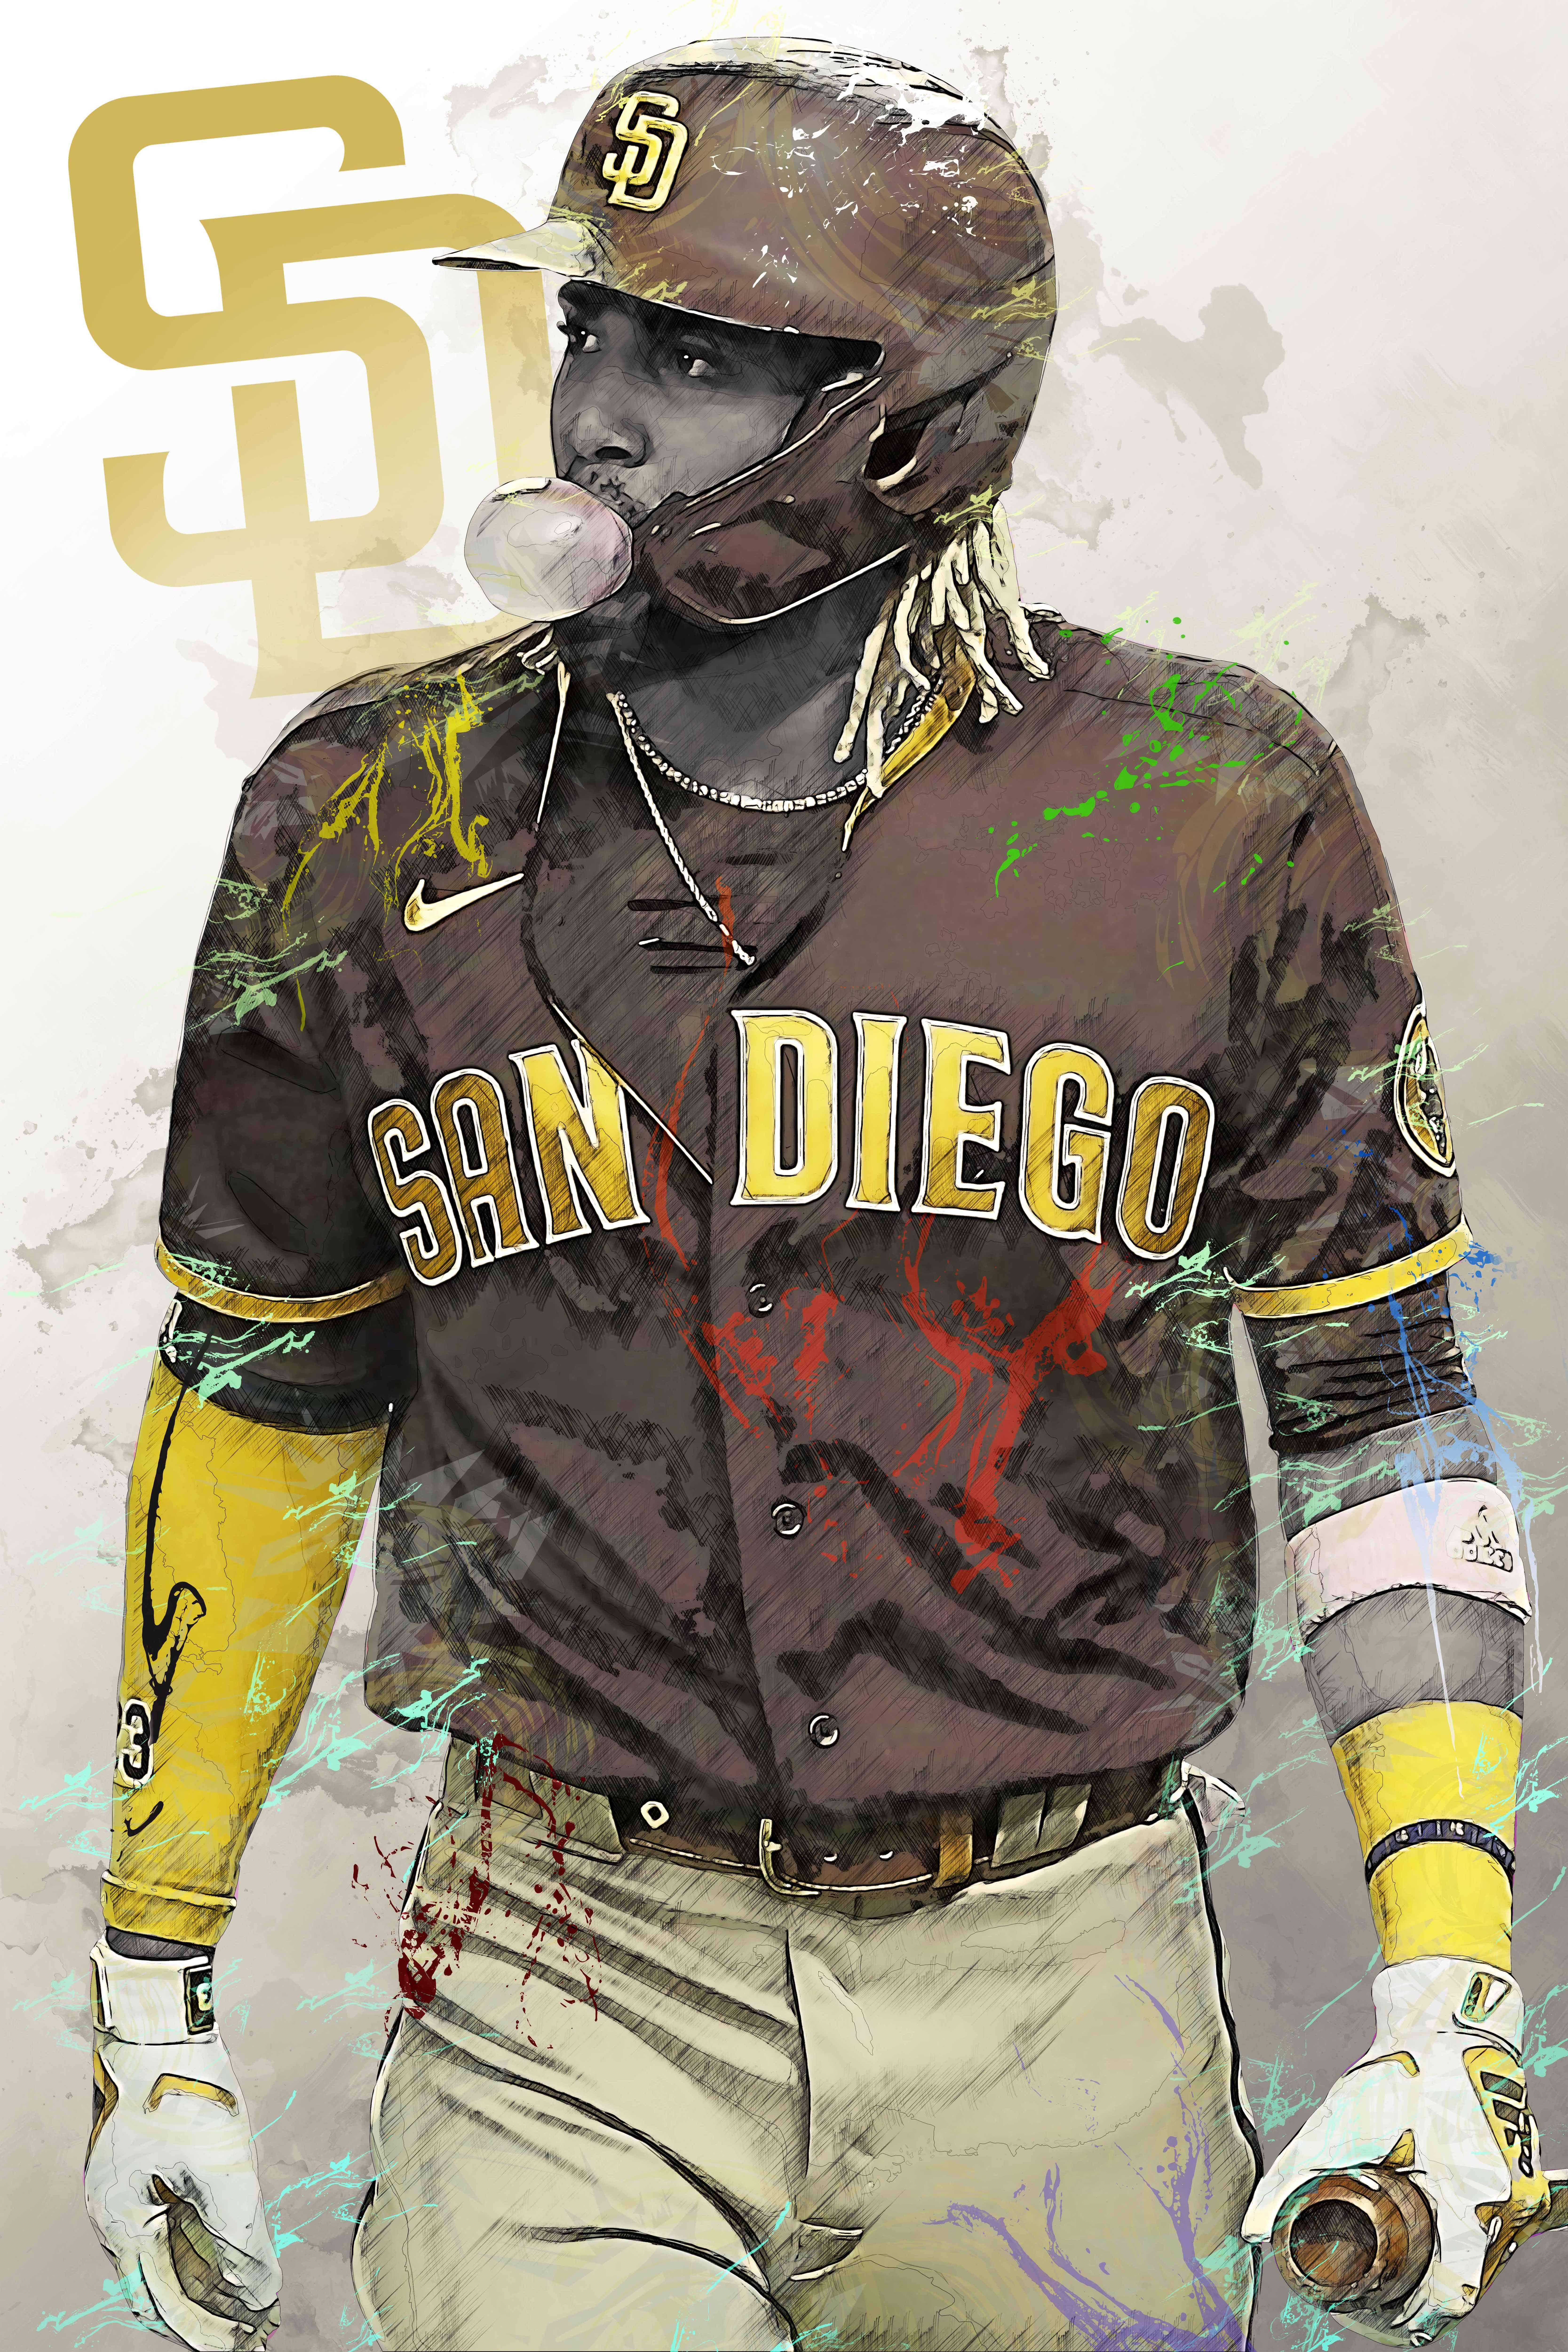 Photo of Fernando Tatis Jr Poster – San Diego Padres – Wall Art, Sports Art Print, Baseball Poster, Gift